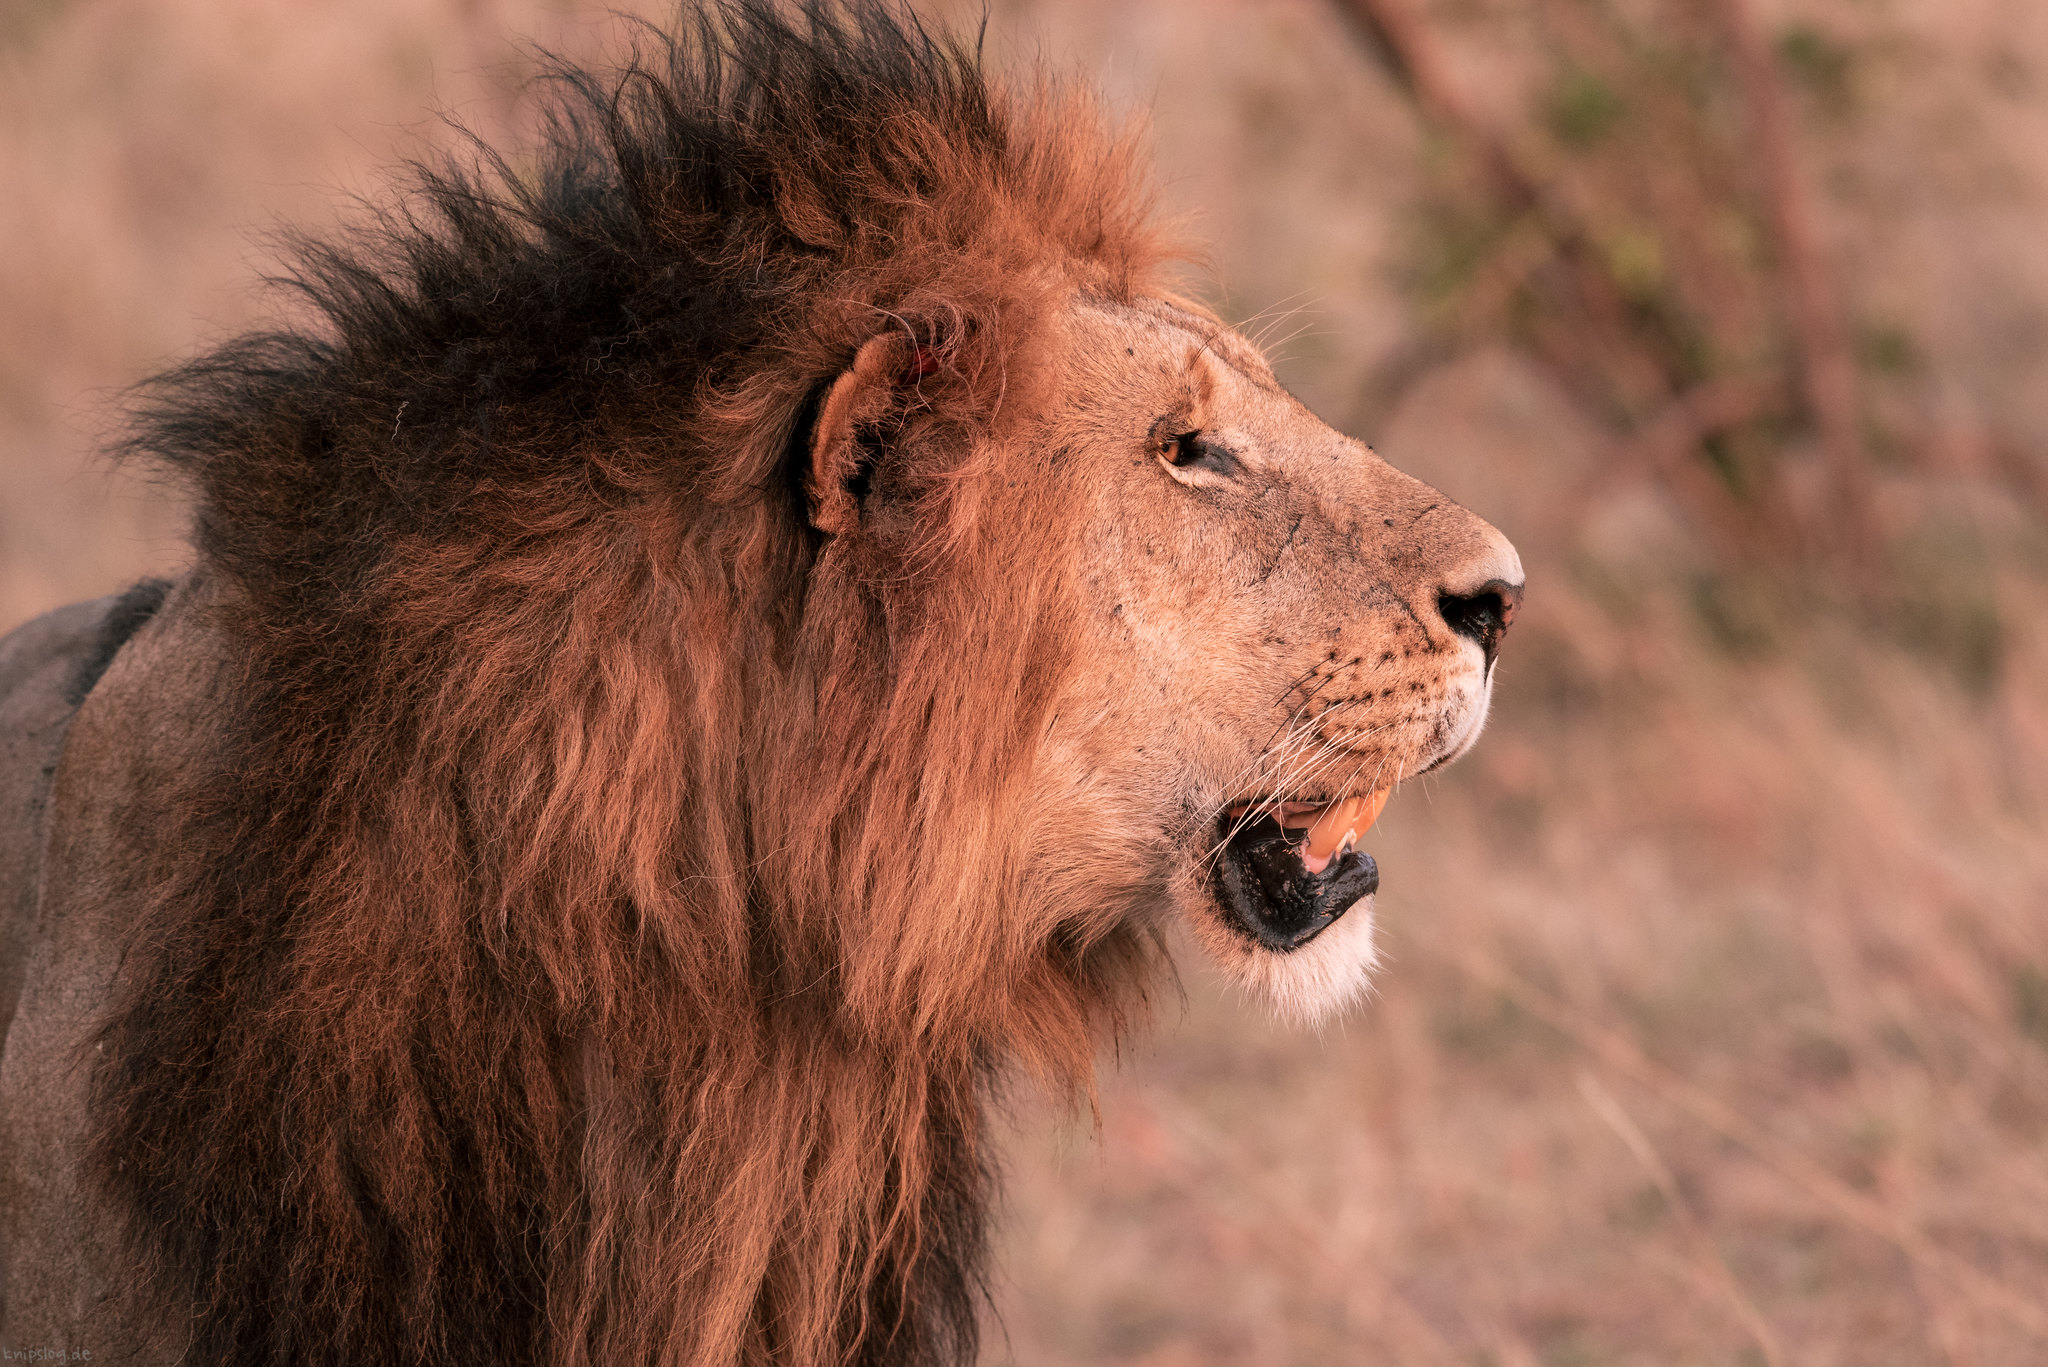 Impressive lion in the morning light